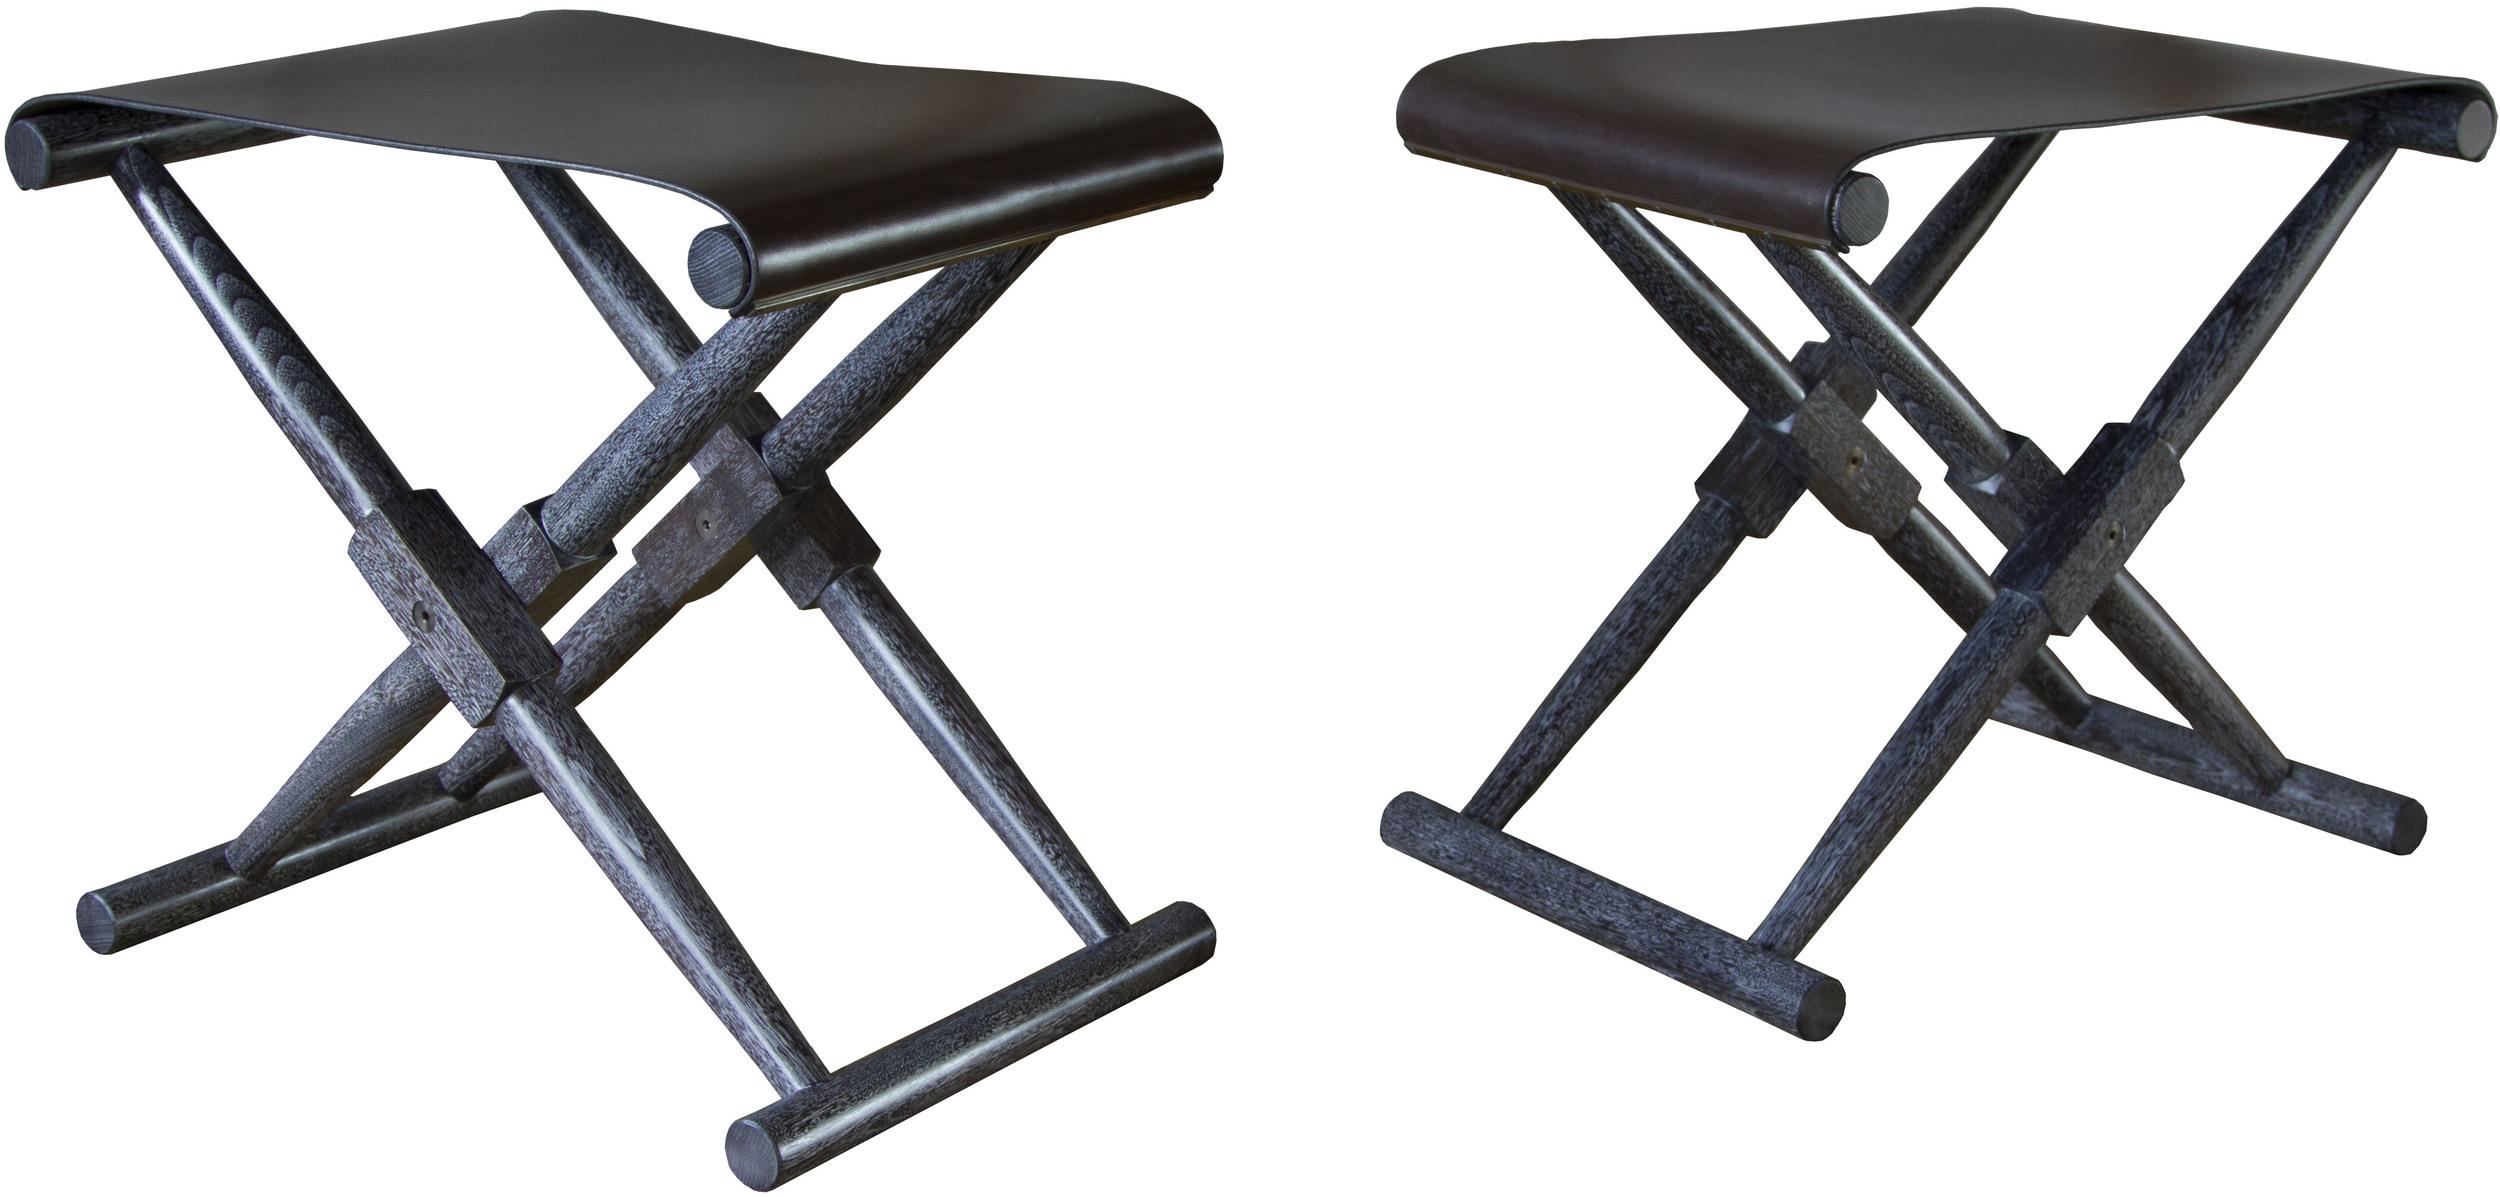 Matthiessen Stools with dark chocolate seats